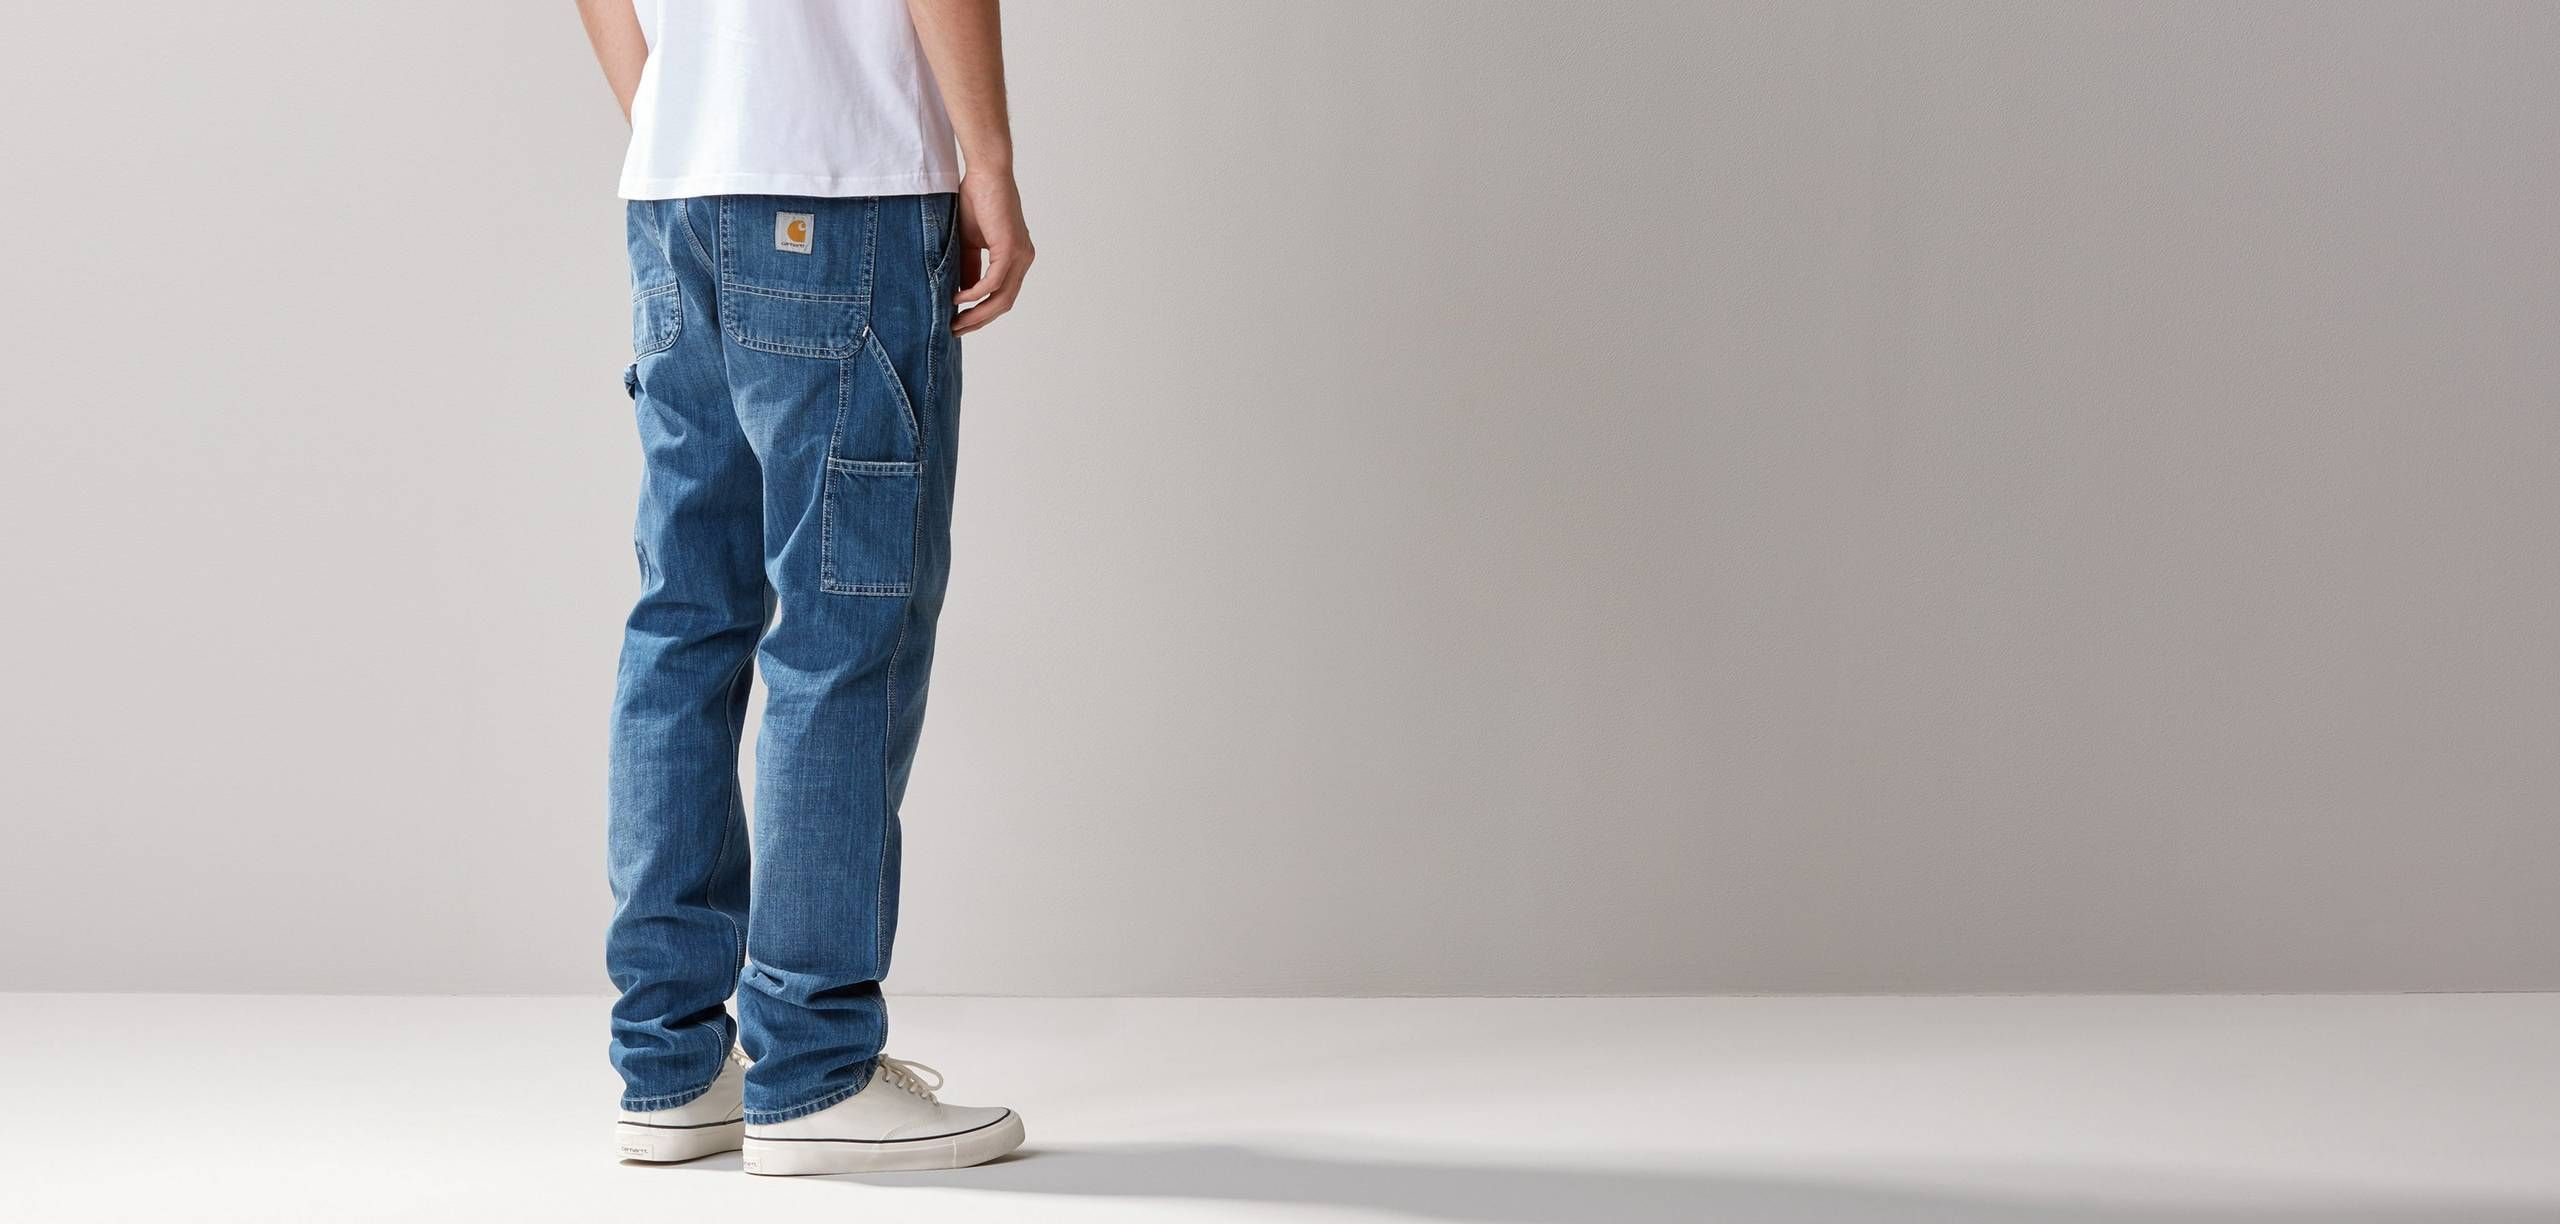 c40d67b5 Ruck Single Knee Pant | Things to Wear | Carhartt wip, Pants, Carhartt